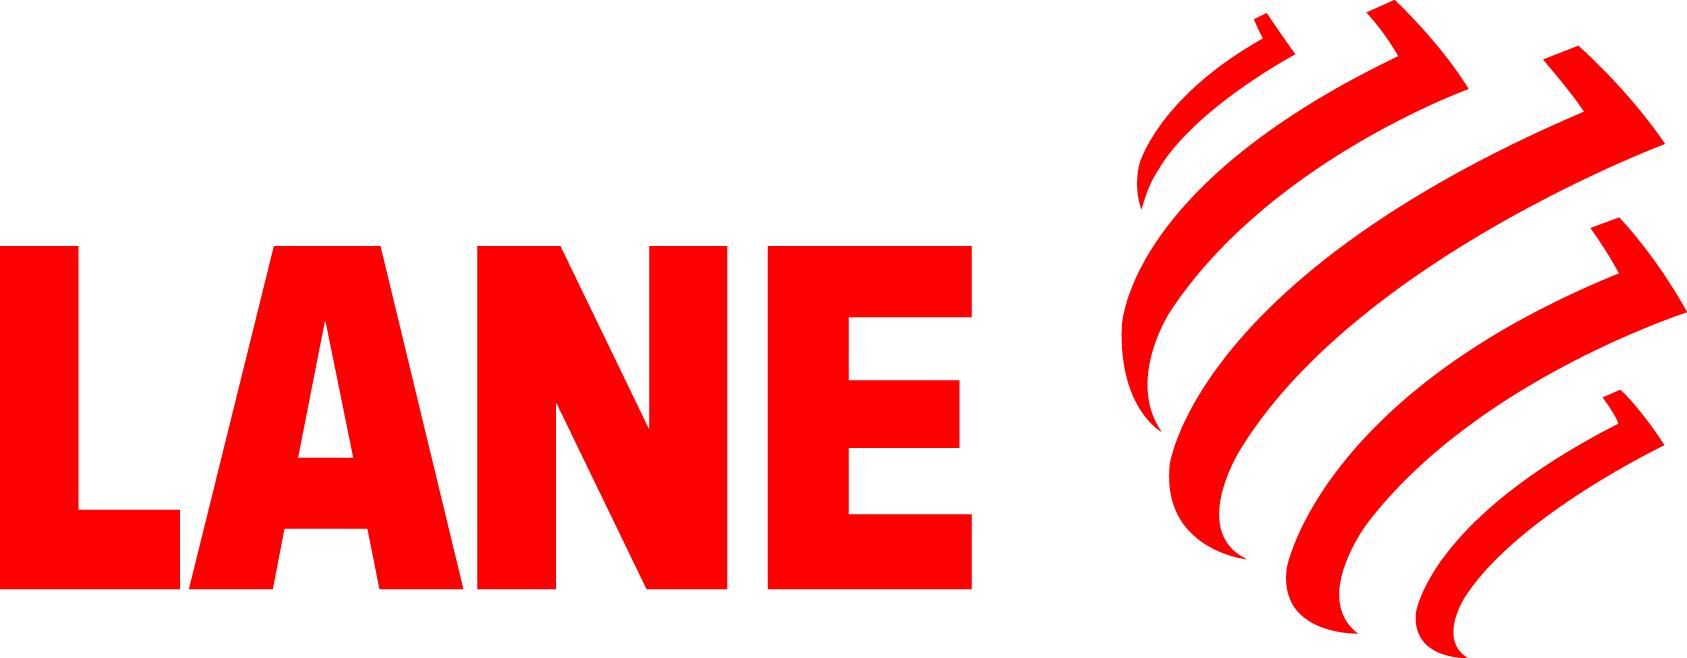 Lane_logo_PMS.JPG